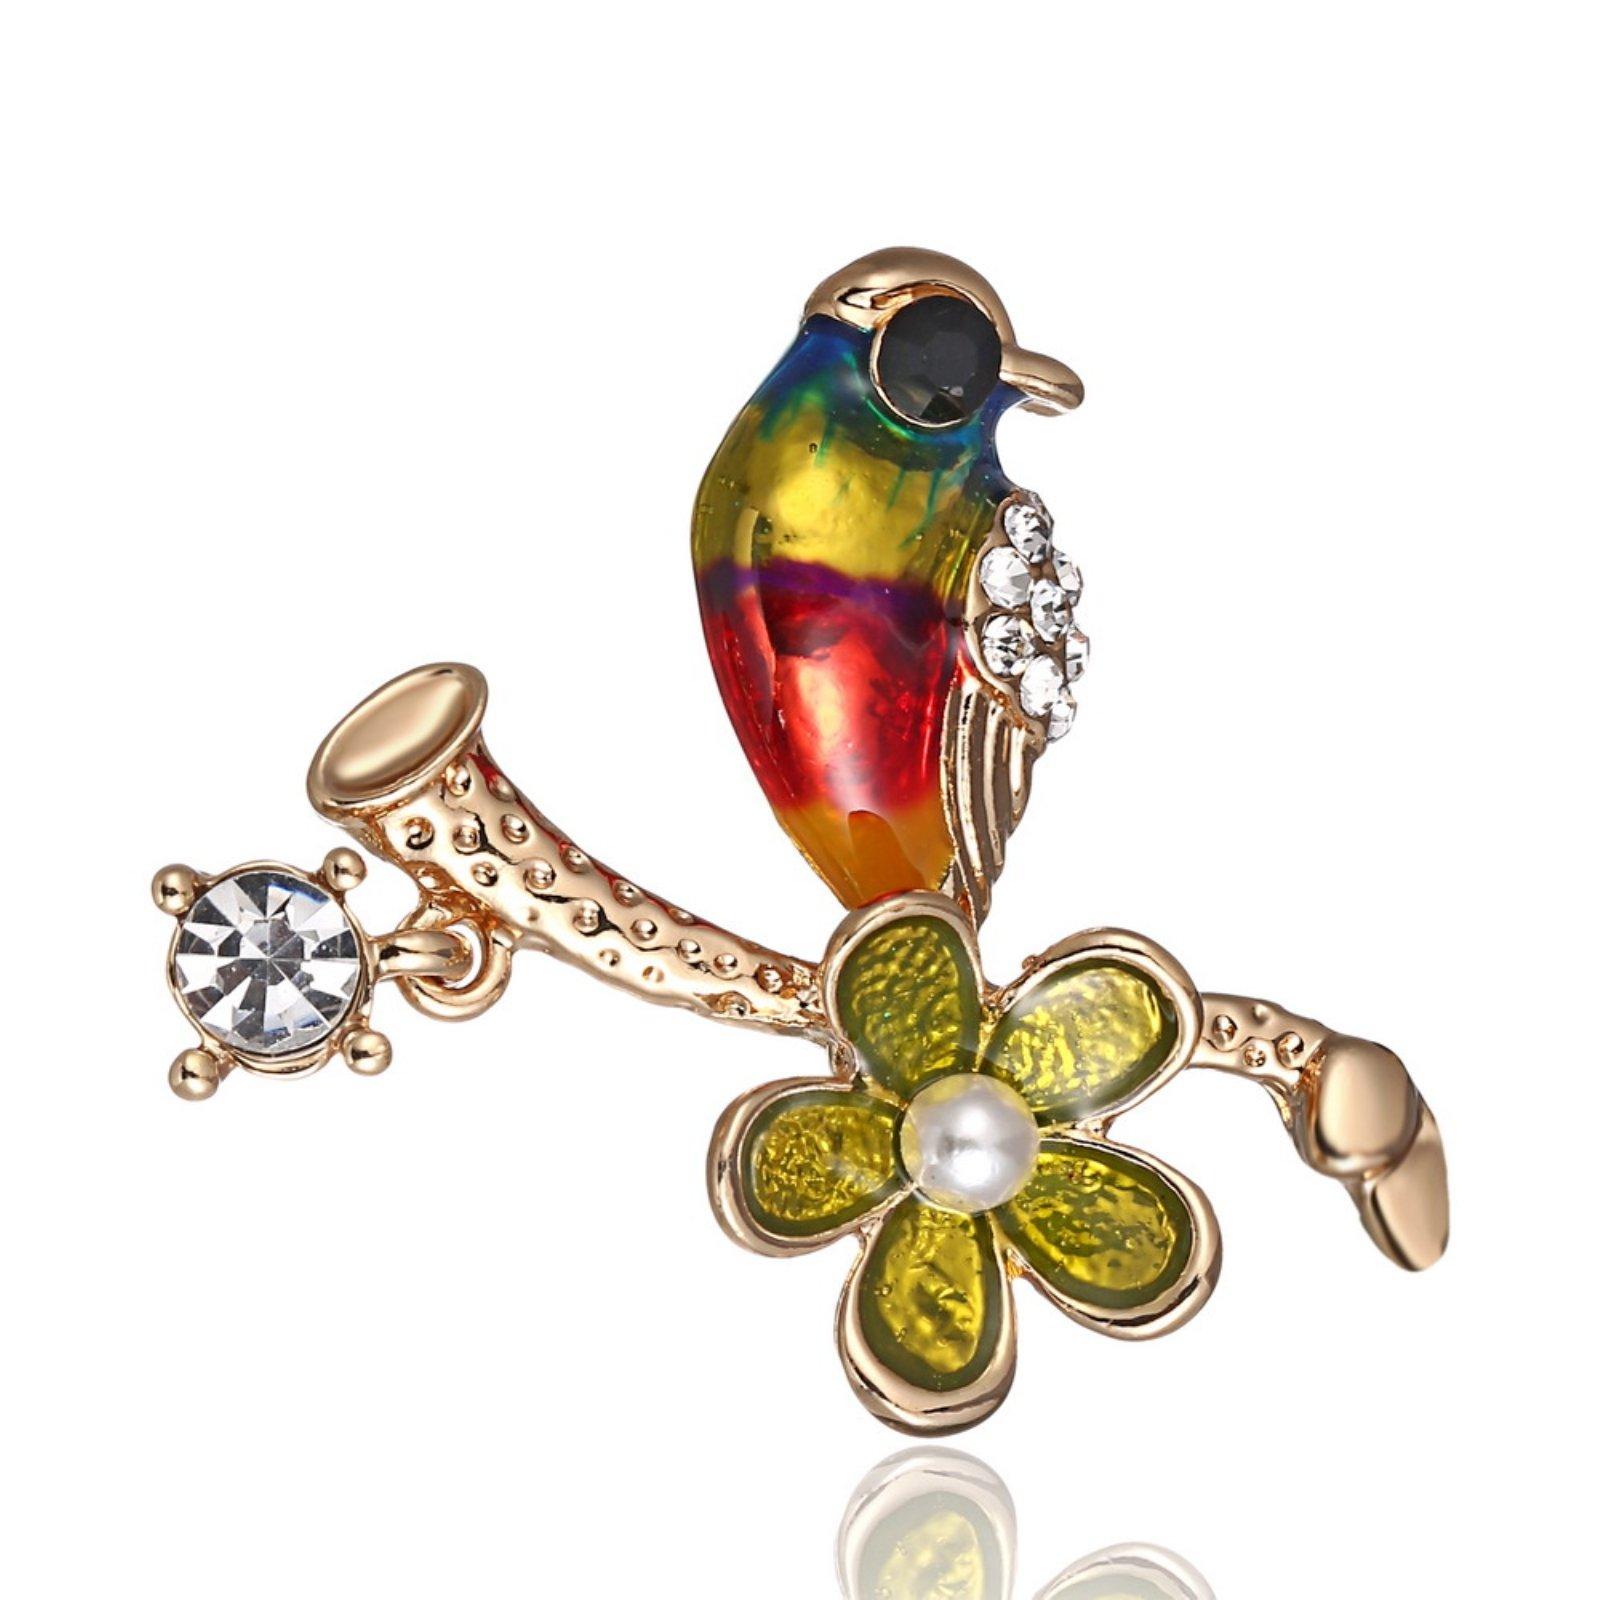 ptk12 Women Decoration Wild Animal Fashion Gold Jewelry Rhinestone Colorful Bird Brooch Animal